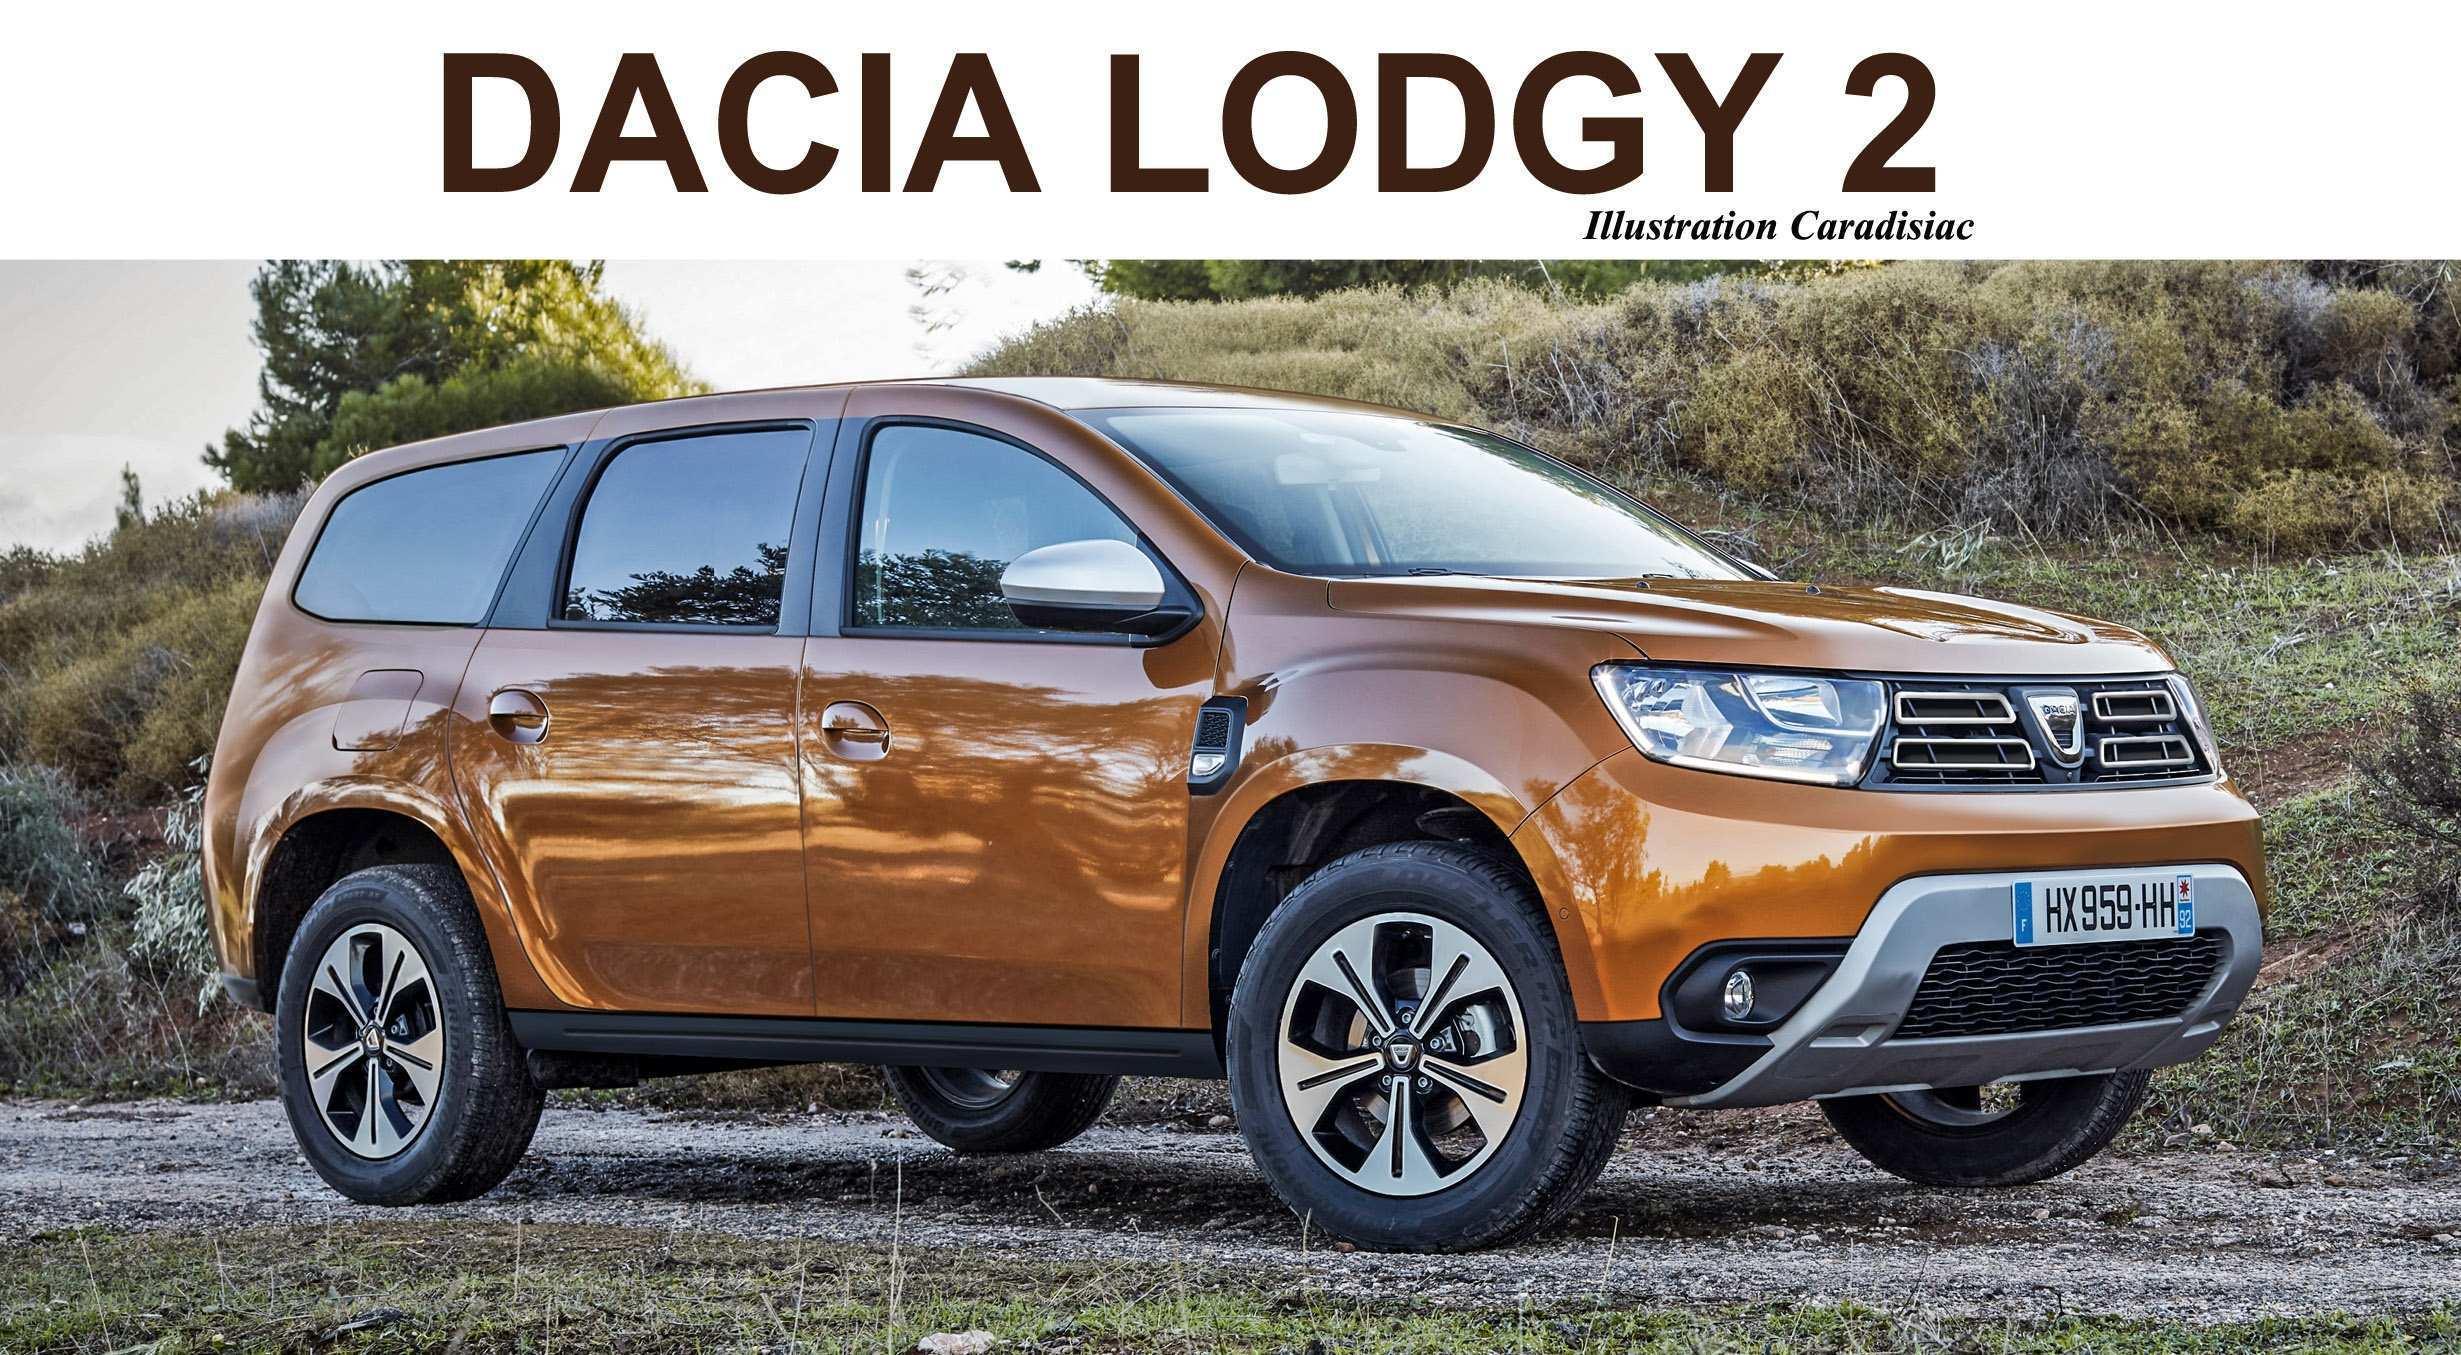 65 Great Futur Dacia 2020 Ratings with Futur Dacia 2020